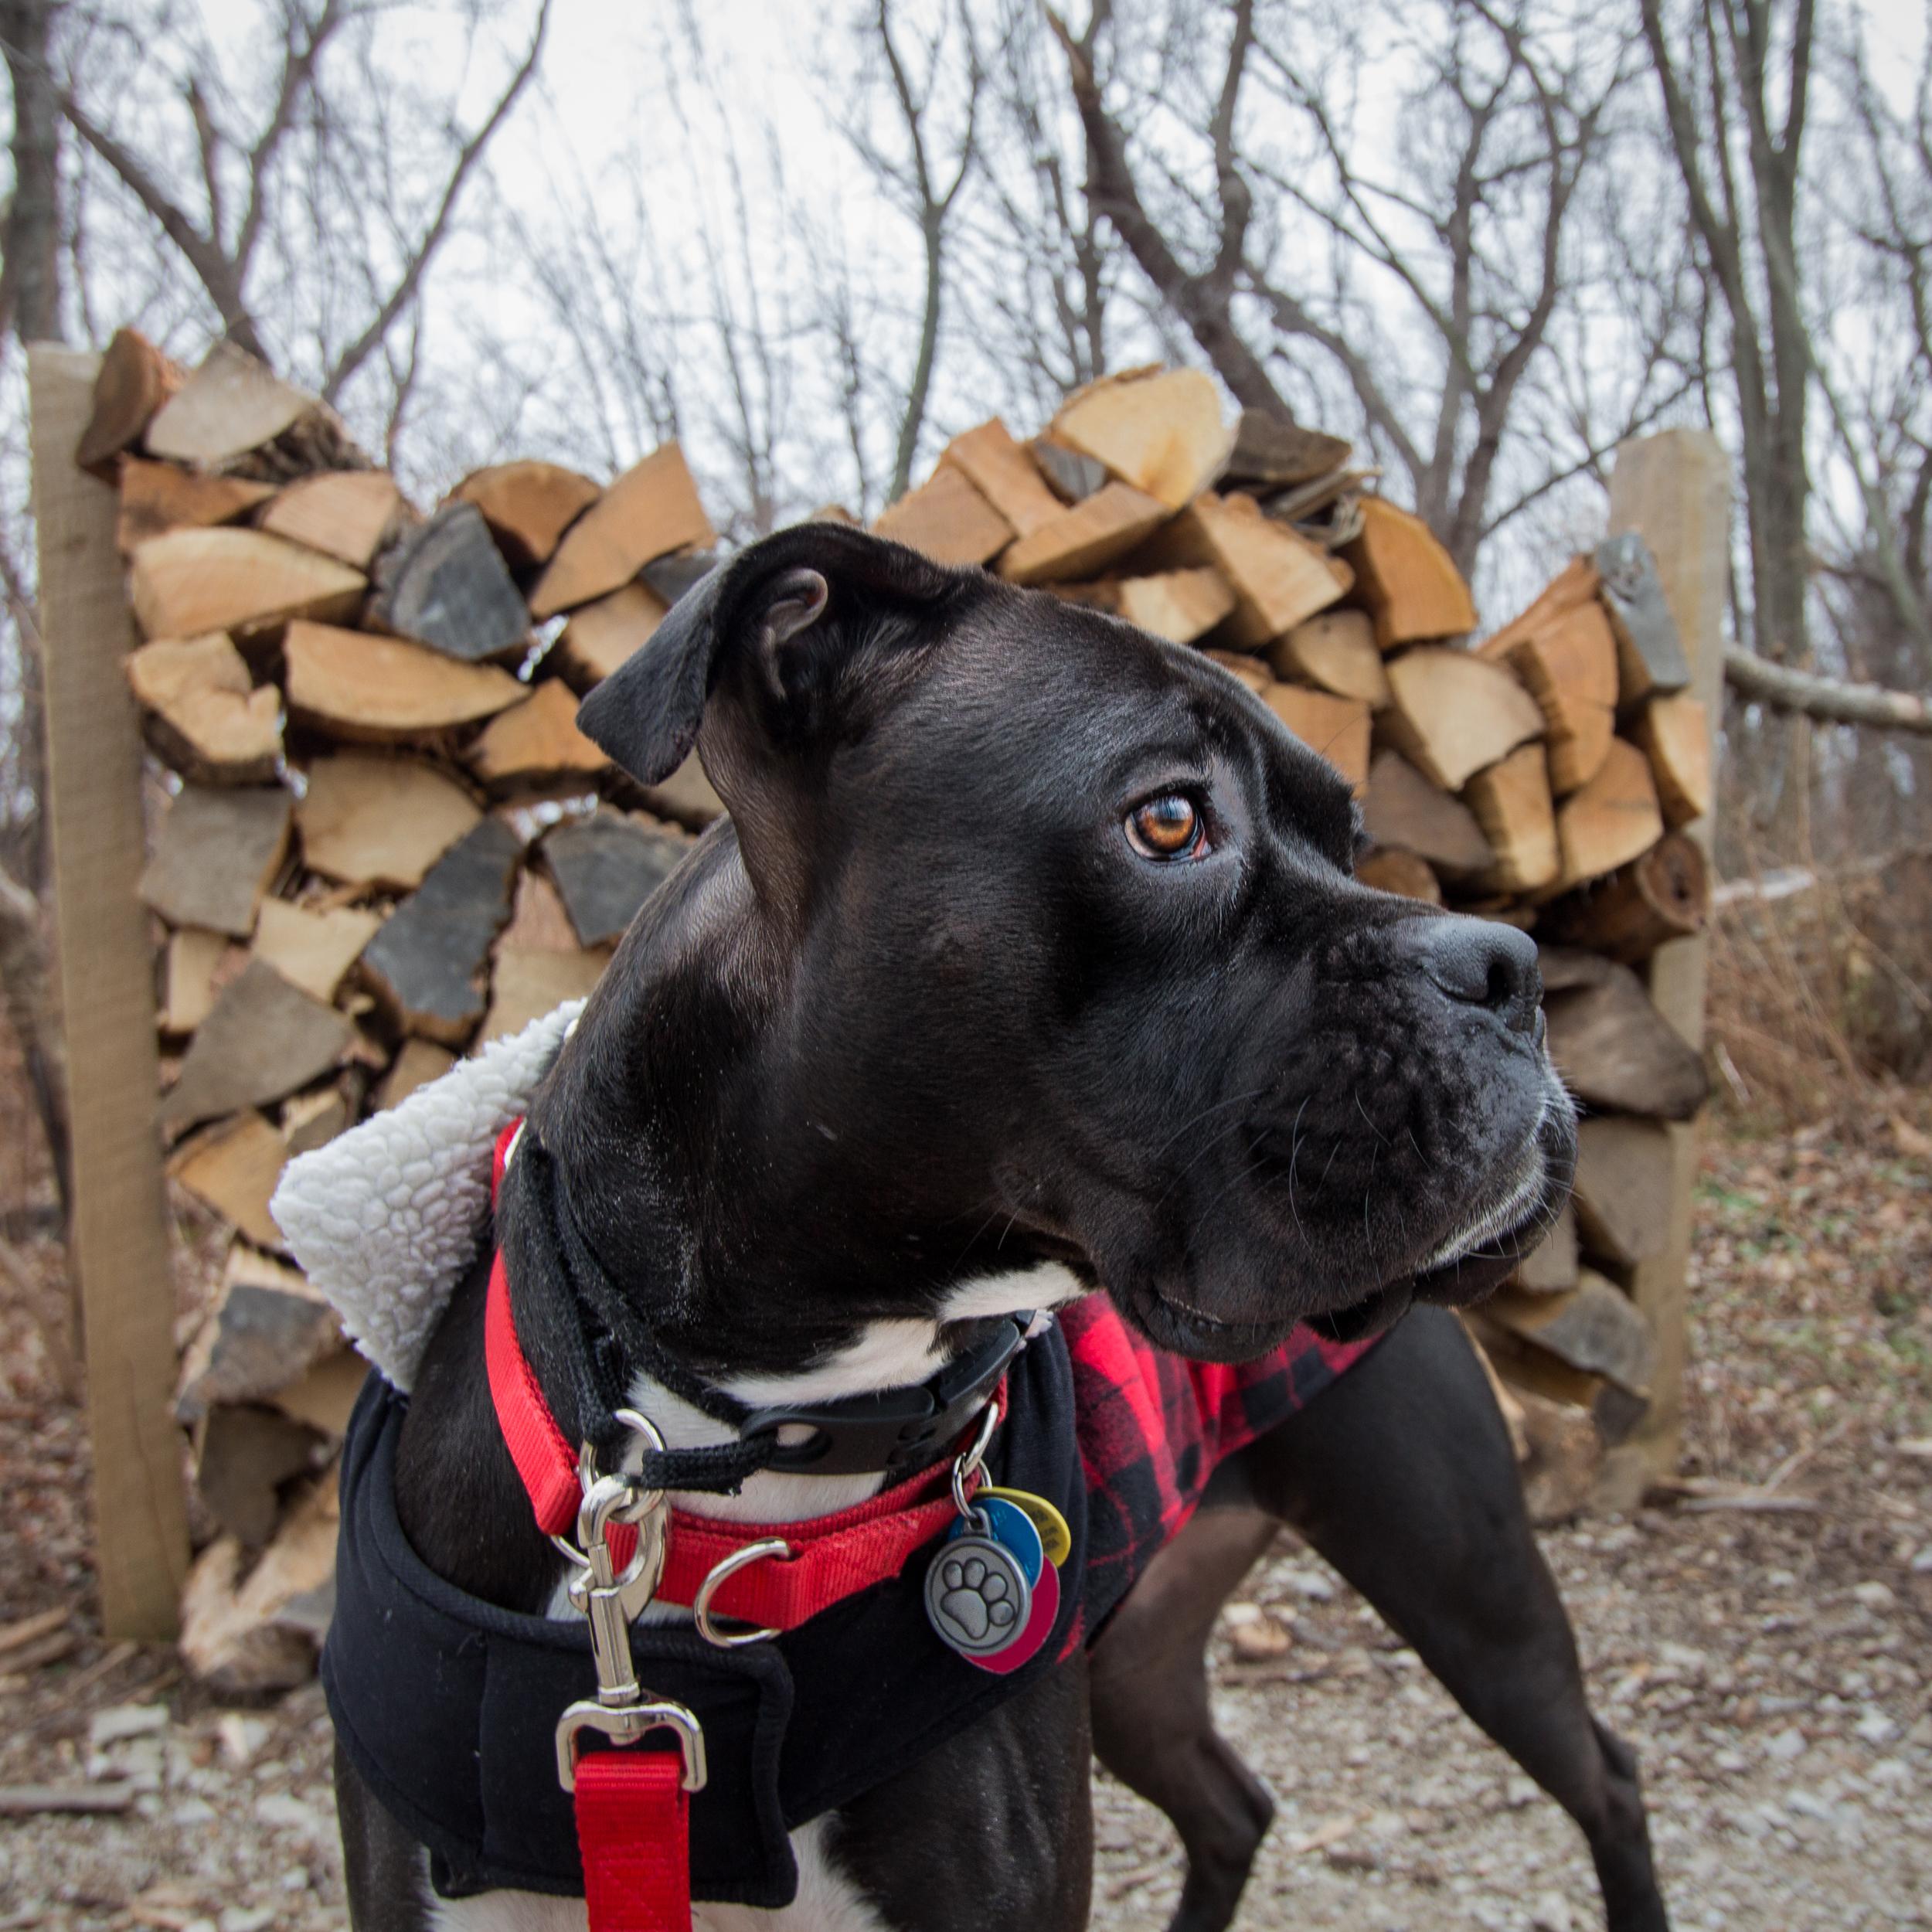 Bluffs_lumberjack-1.jpg